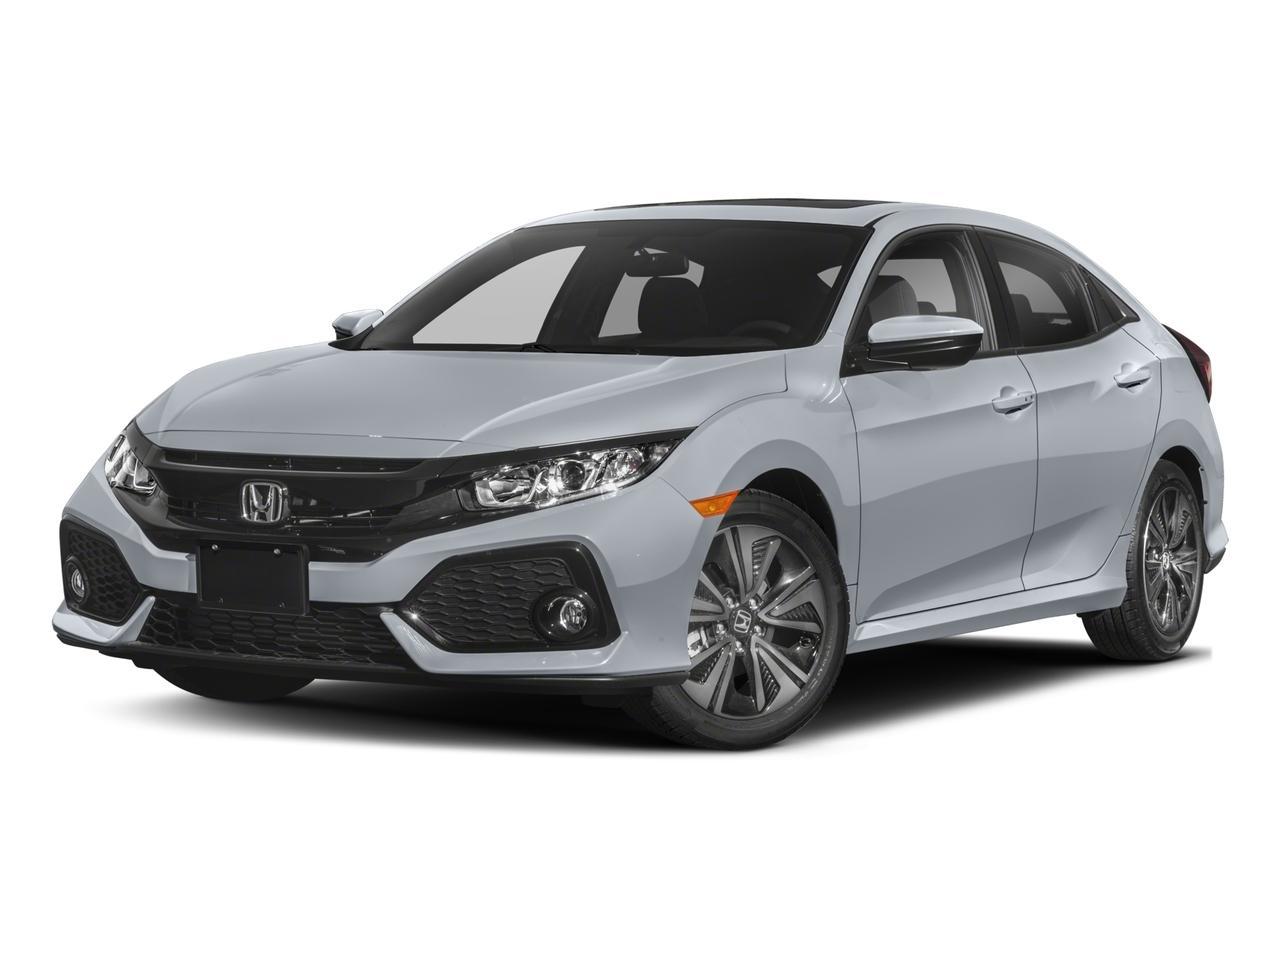 2018 Honda Civic Hatchback Vehicle Photo in Edinburg, TX 78539